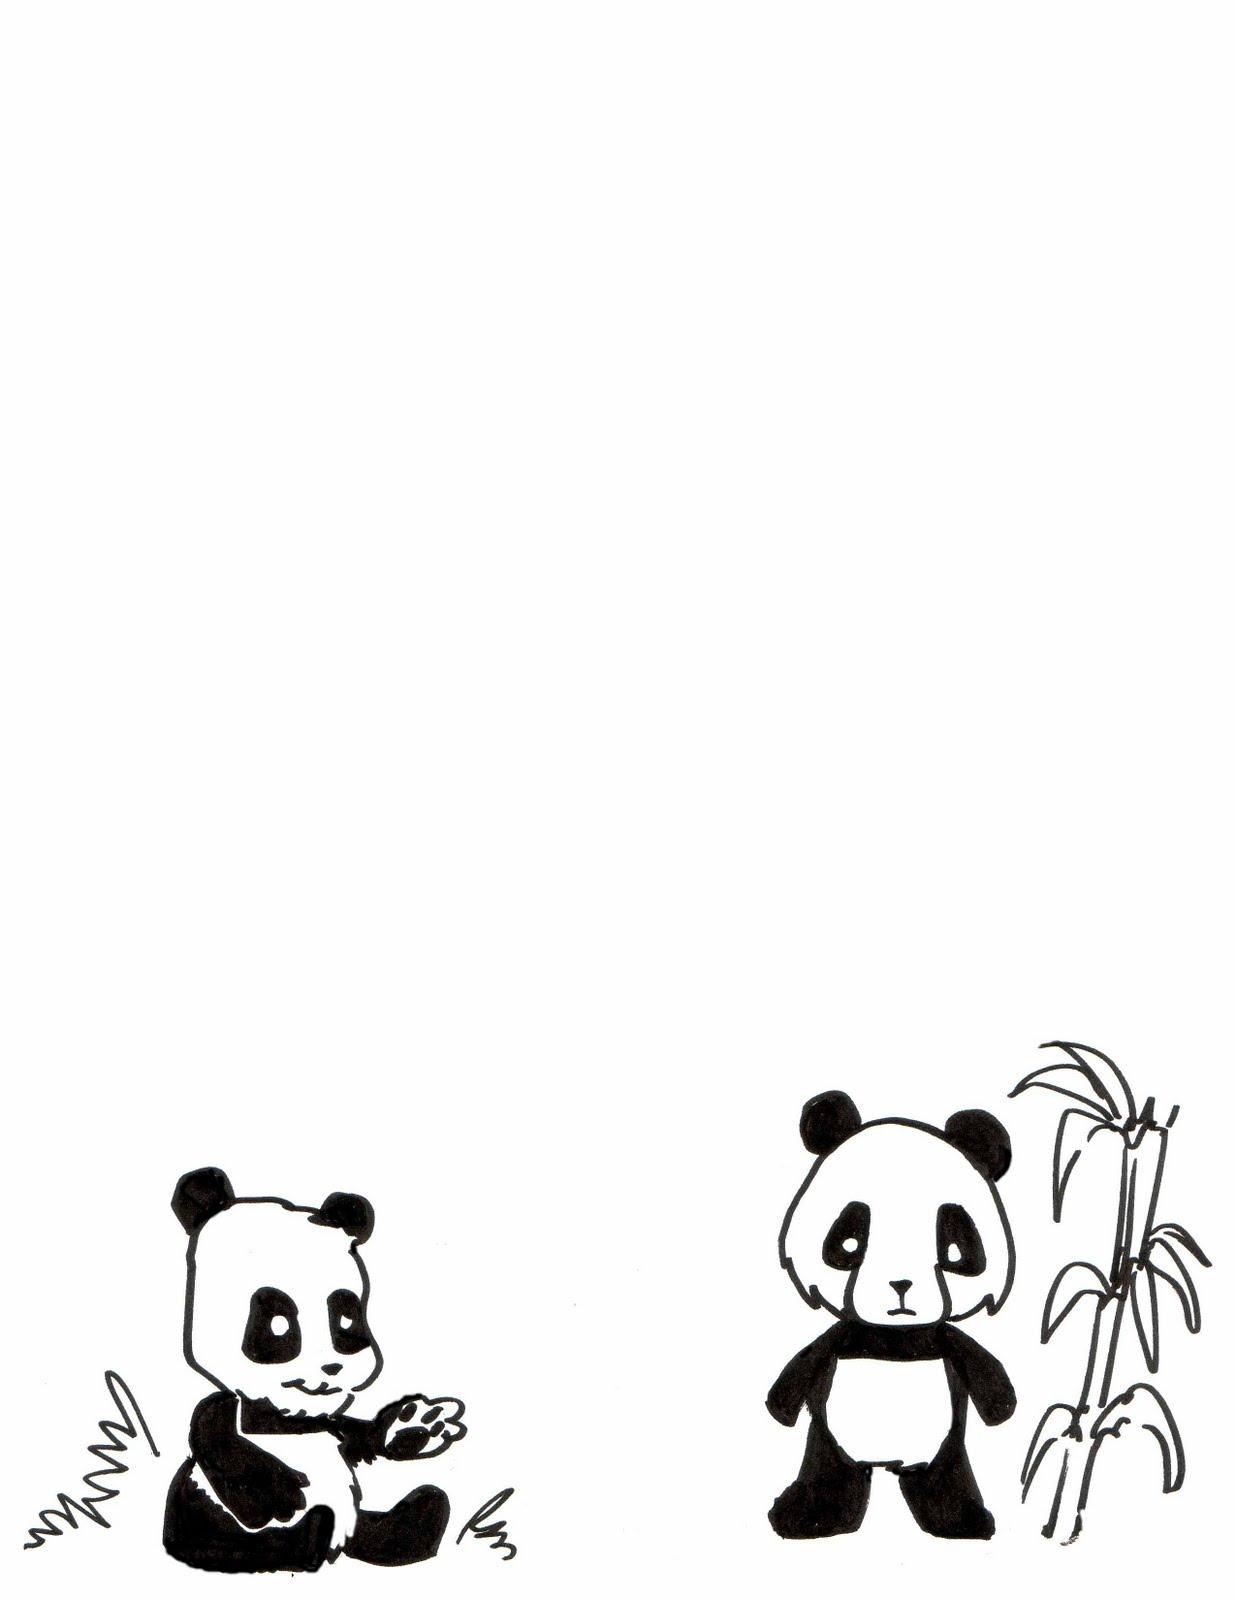 Panda template kids - photo#22